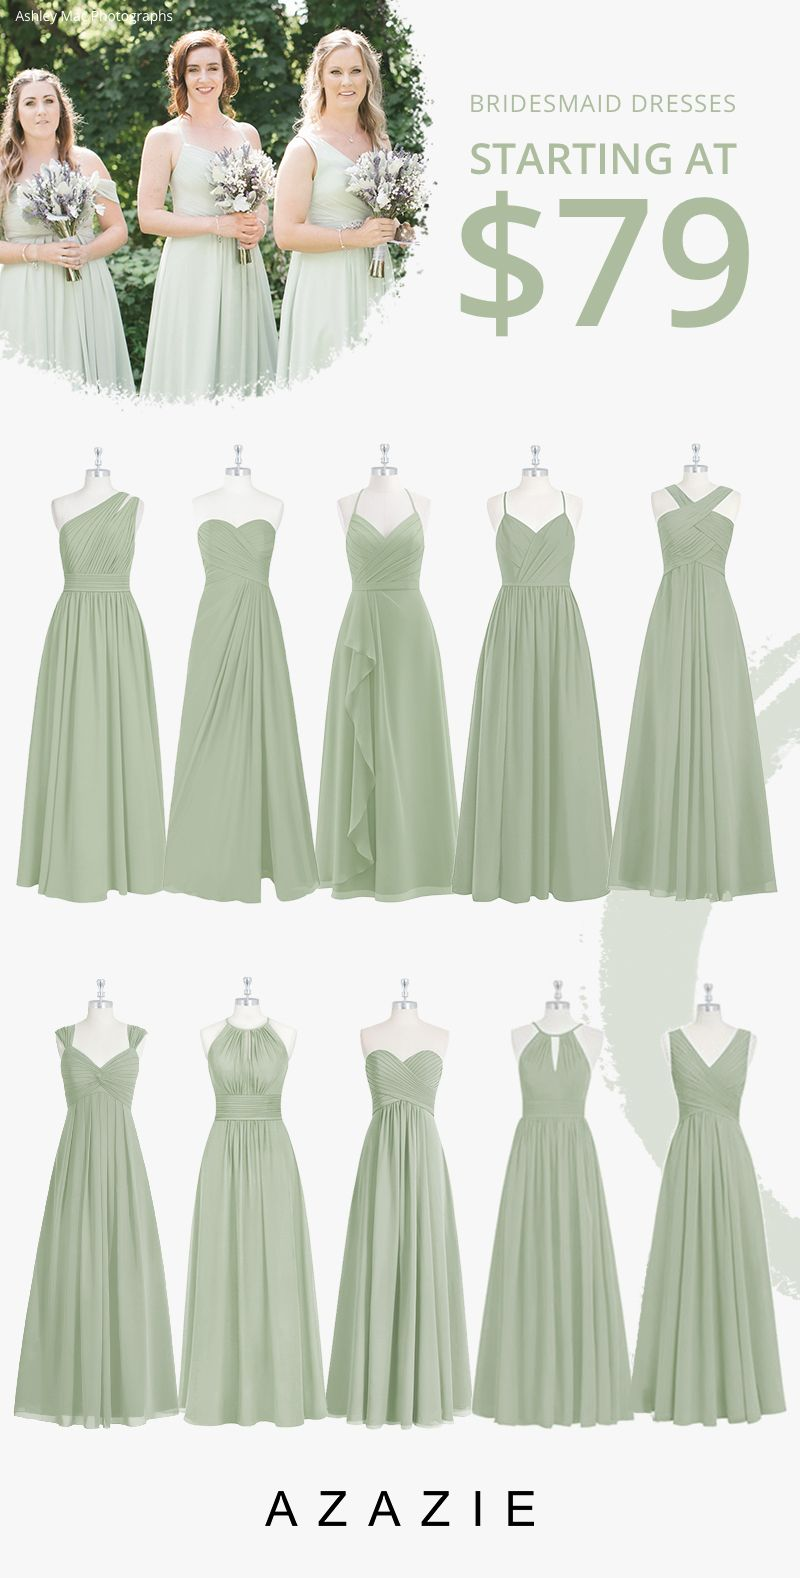 Dusty Sage Bridesmaid Dresses In 2020 Sage Bridesmaid Dresses Bridesmaid Dresses Dusty Sage Sage Green Bridesmaid Dress